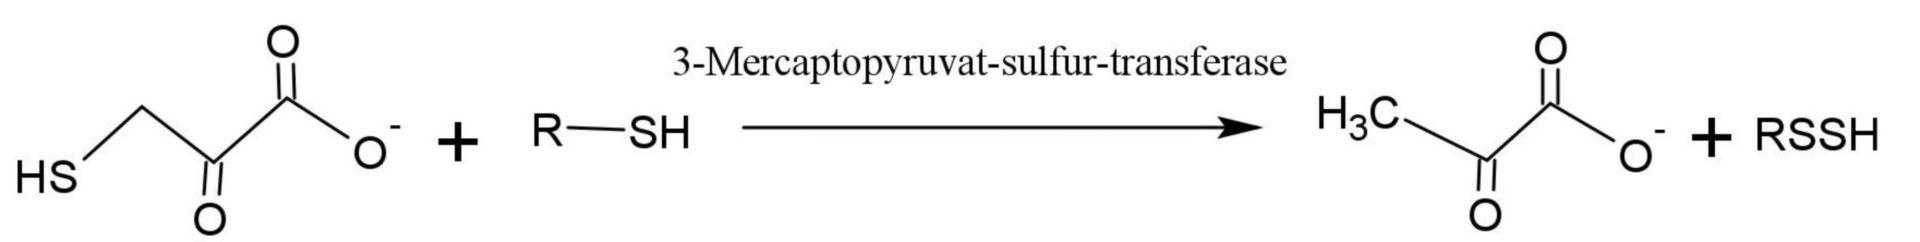 Mercaptopyruvat-Sulfur-Transferase